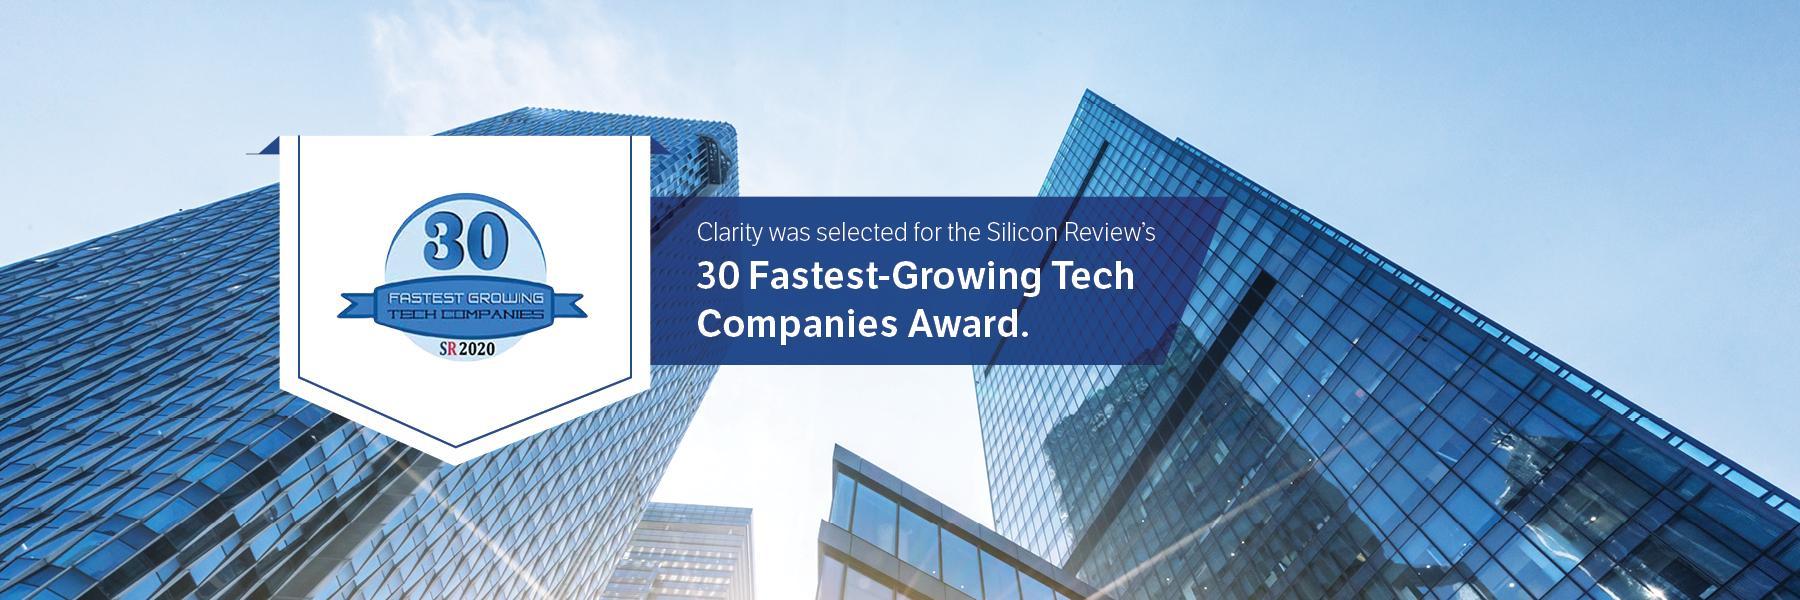 30 Fastest Growing Tech Award